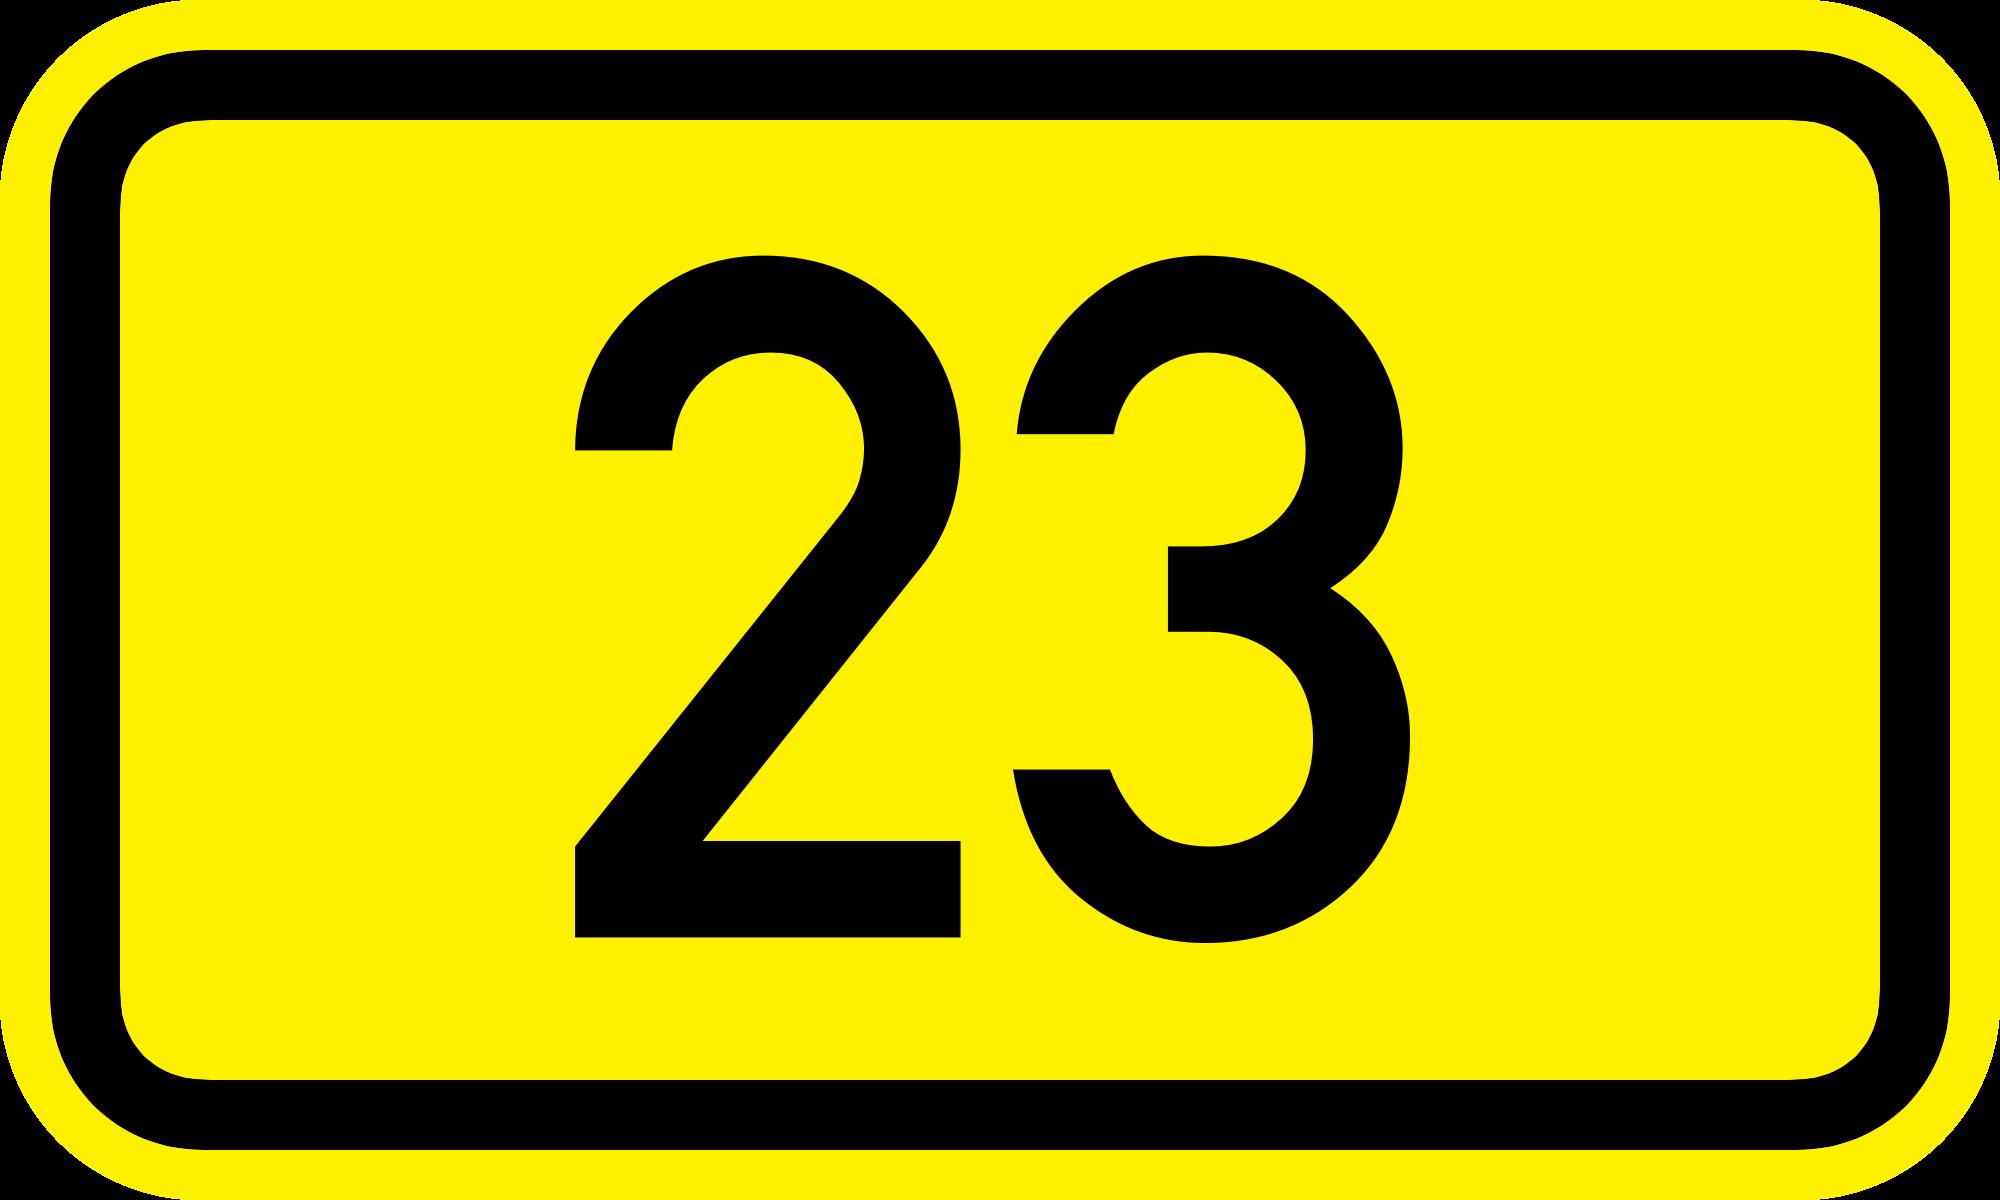 23 png 4 » PNG Image.